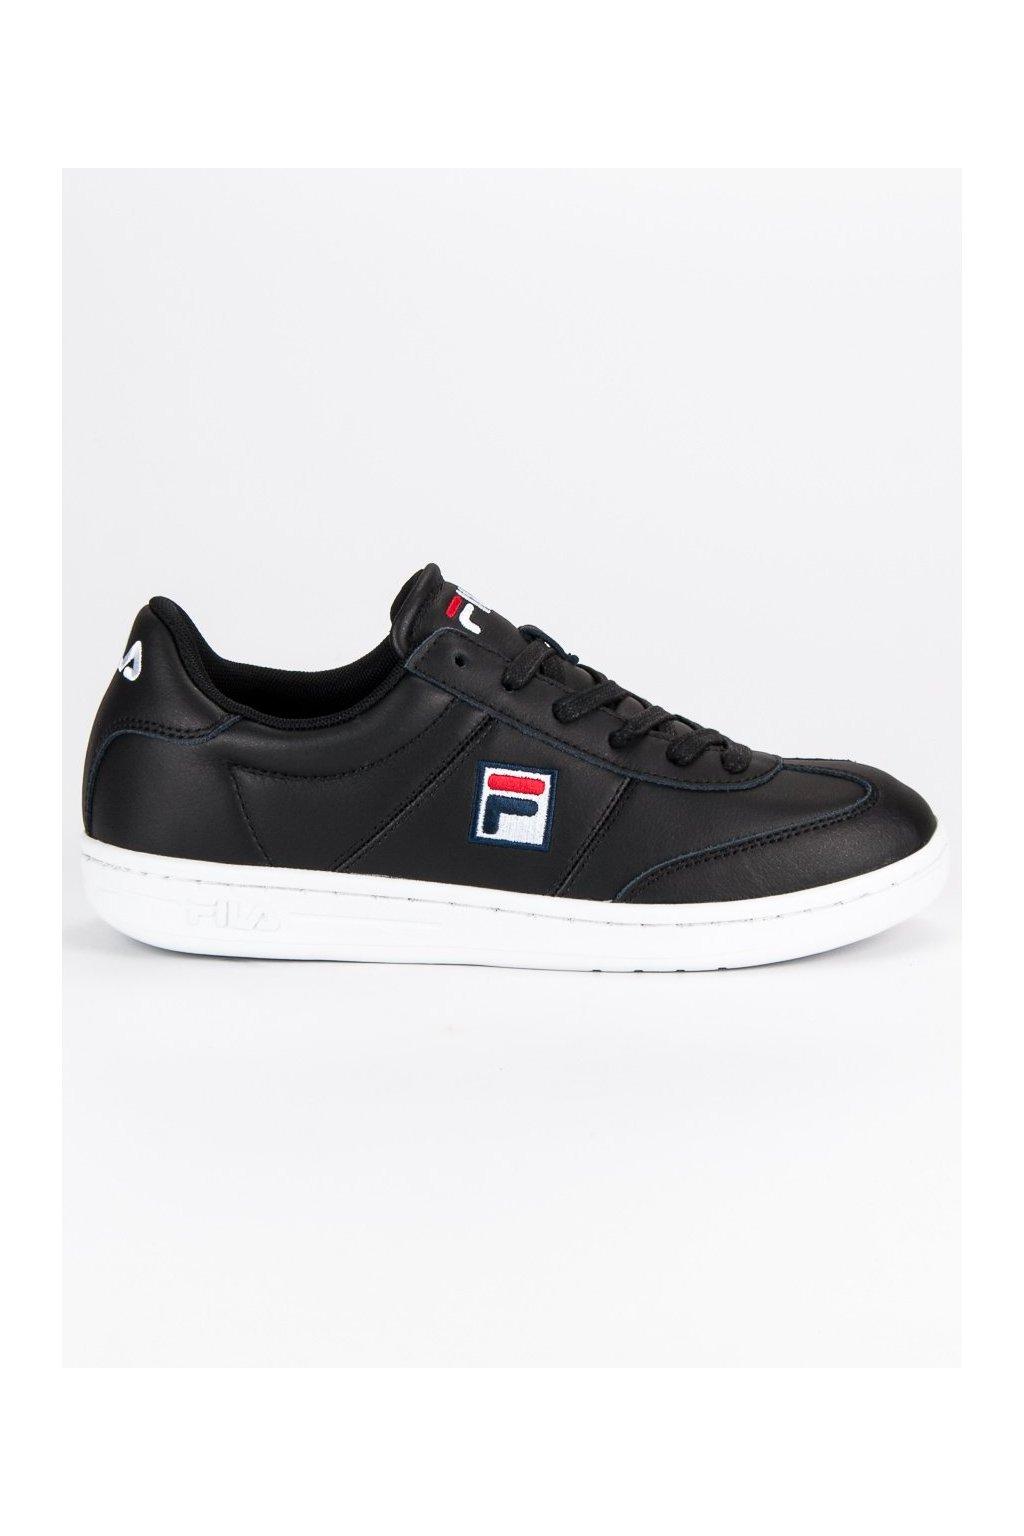 992d00e499d6d Panska basketbalova obuv | NAJ.SK